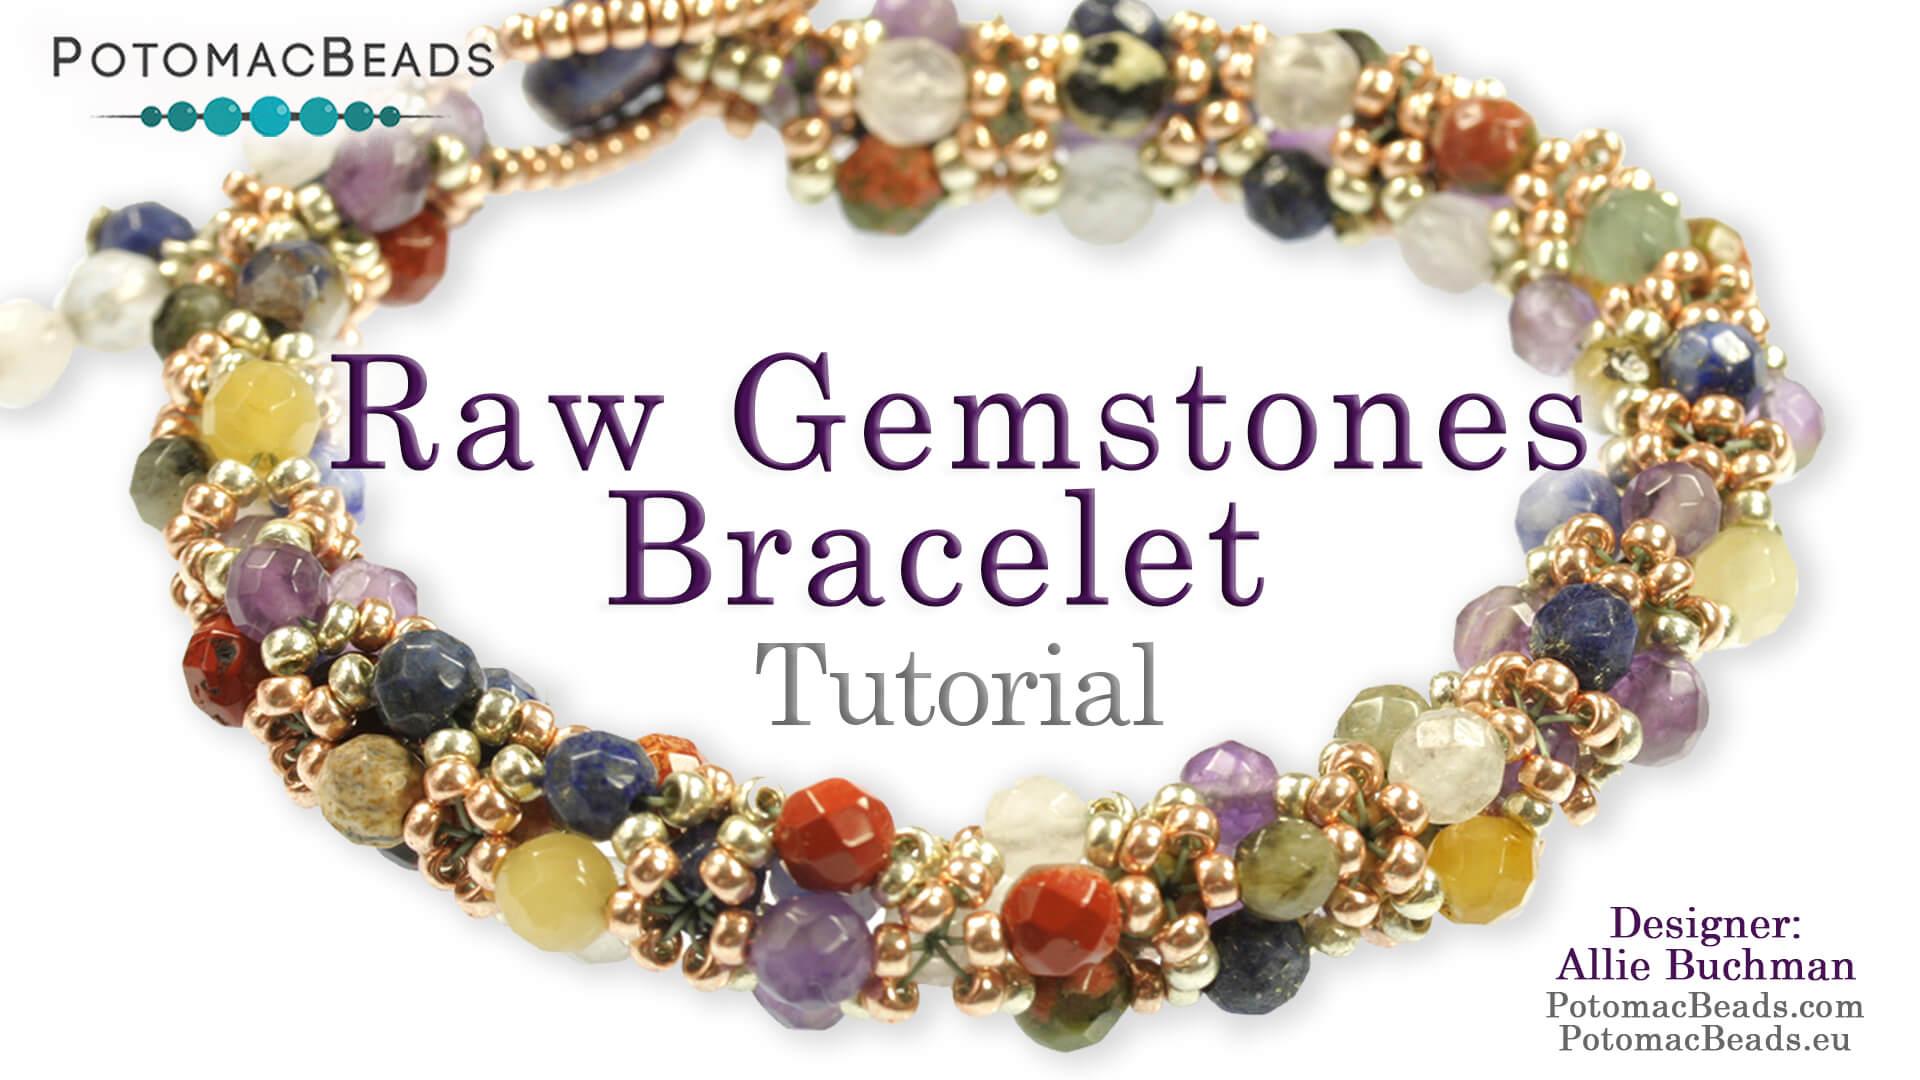 How to Bead Jewelry / Beading Tutorials & Jewel Making Videos / Bracelet Projects / RAW Gemstone Bracelet Tutorial